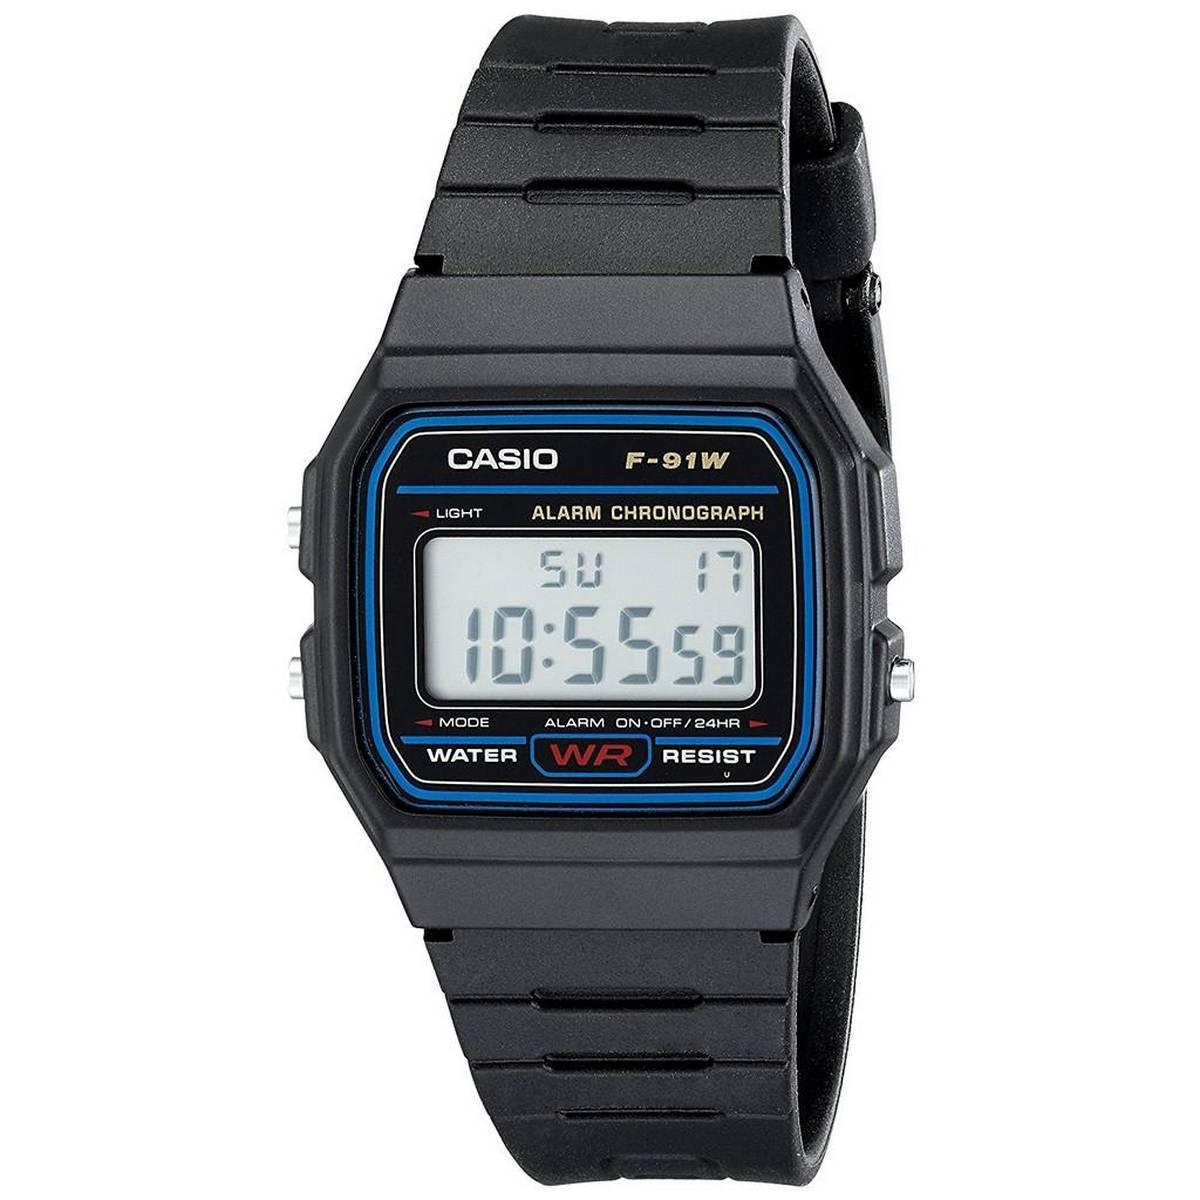 Gasio Digital Wrist Watch for Men